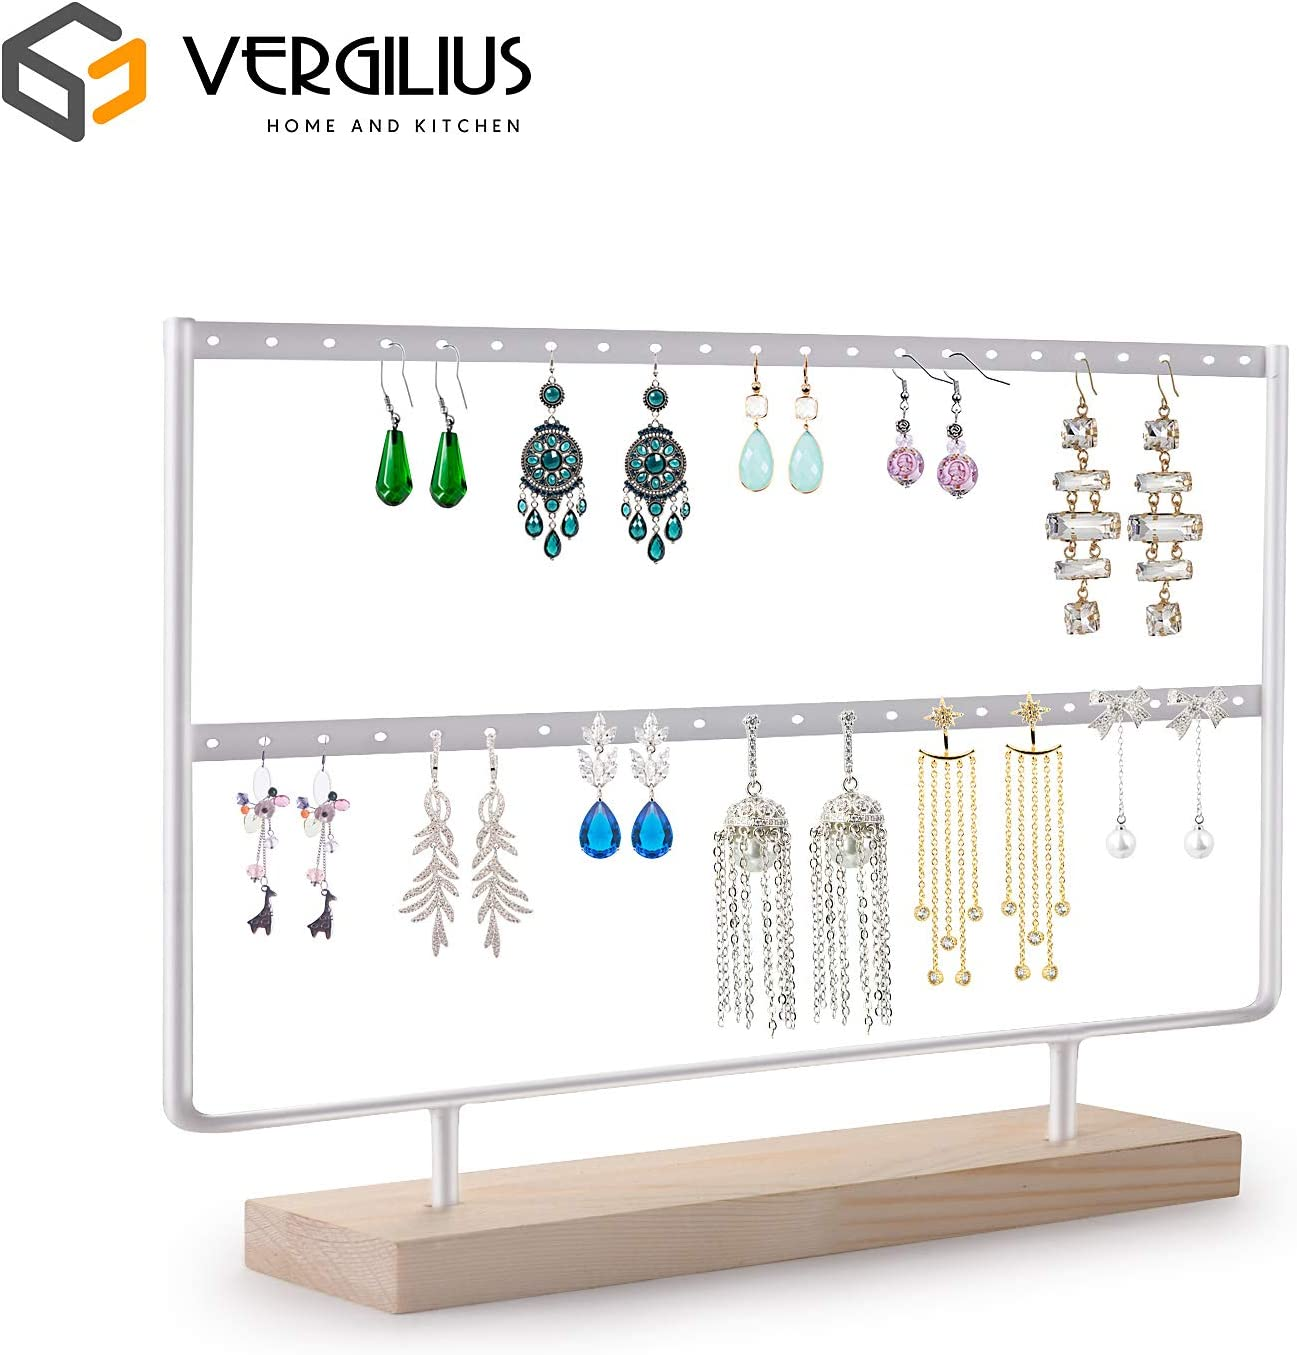 Amazon Com Vergilius Earrings Organizer Jewelry Holder Display Wood Stand White Home Kitchen